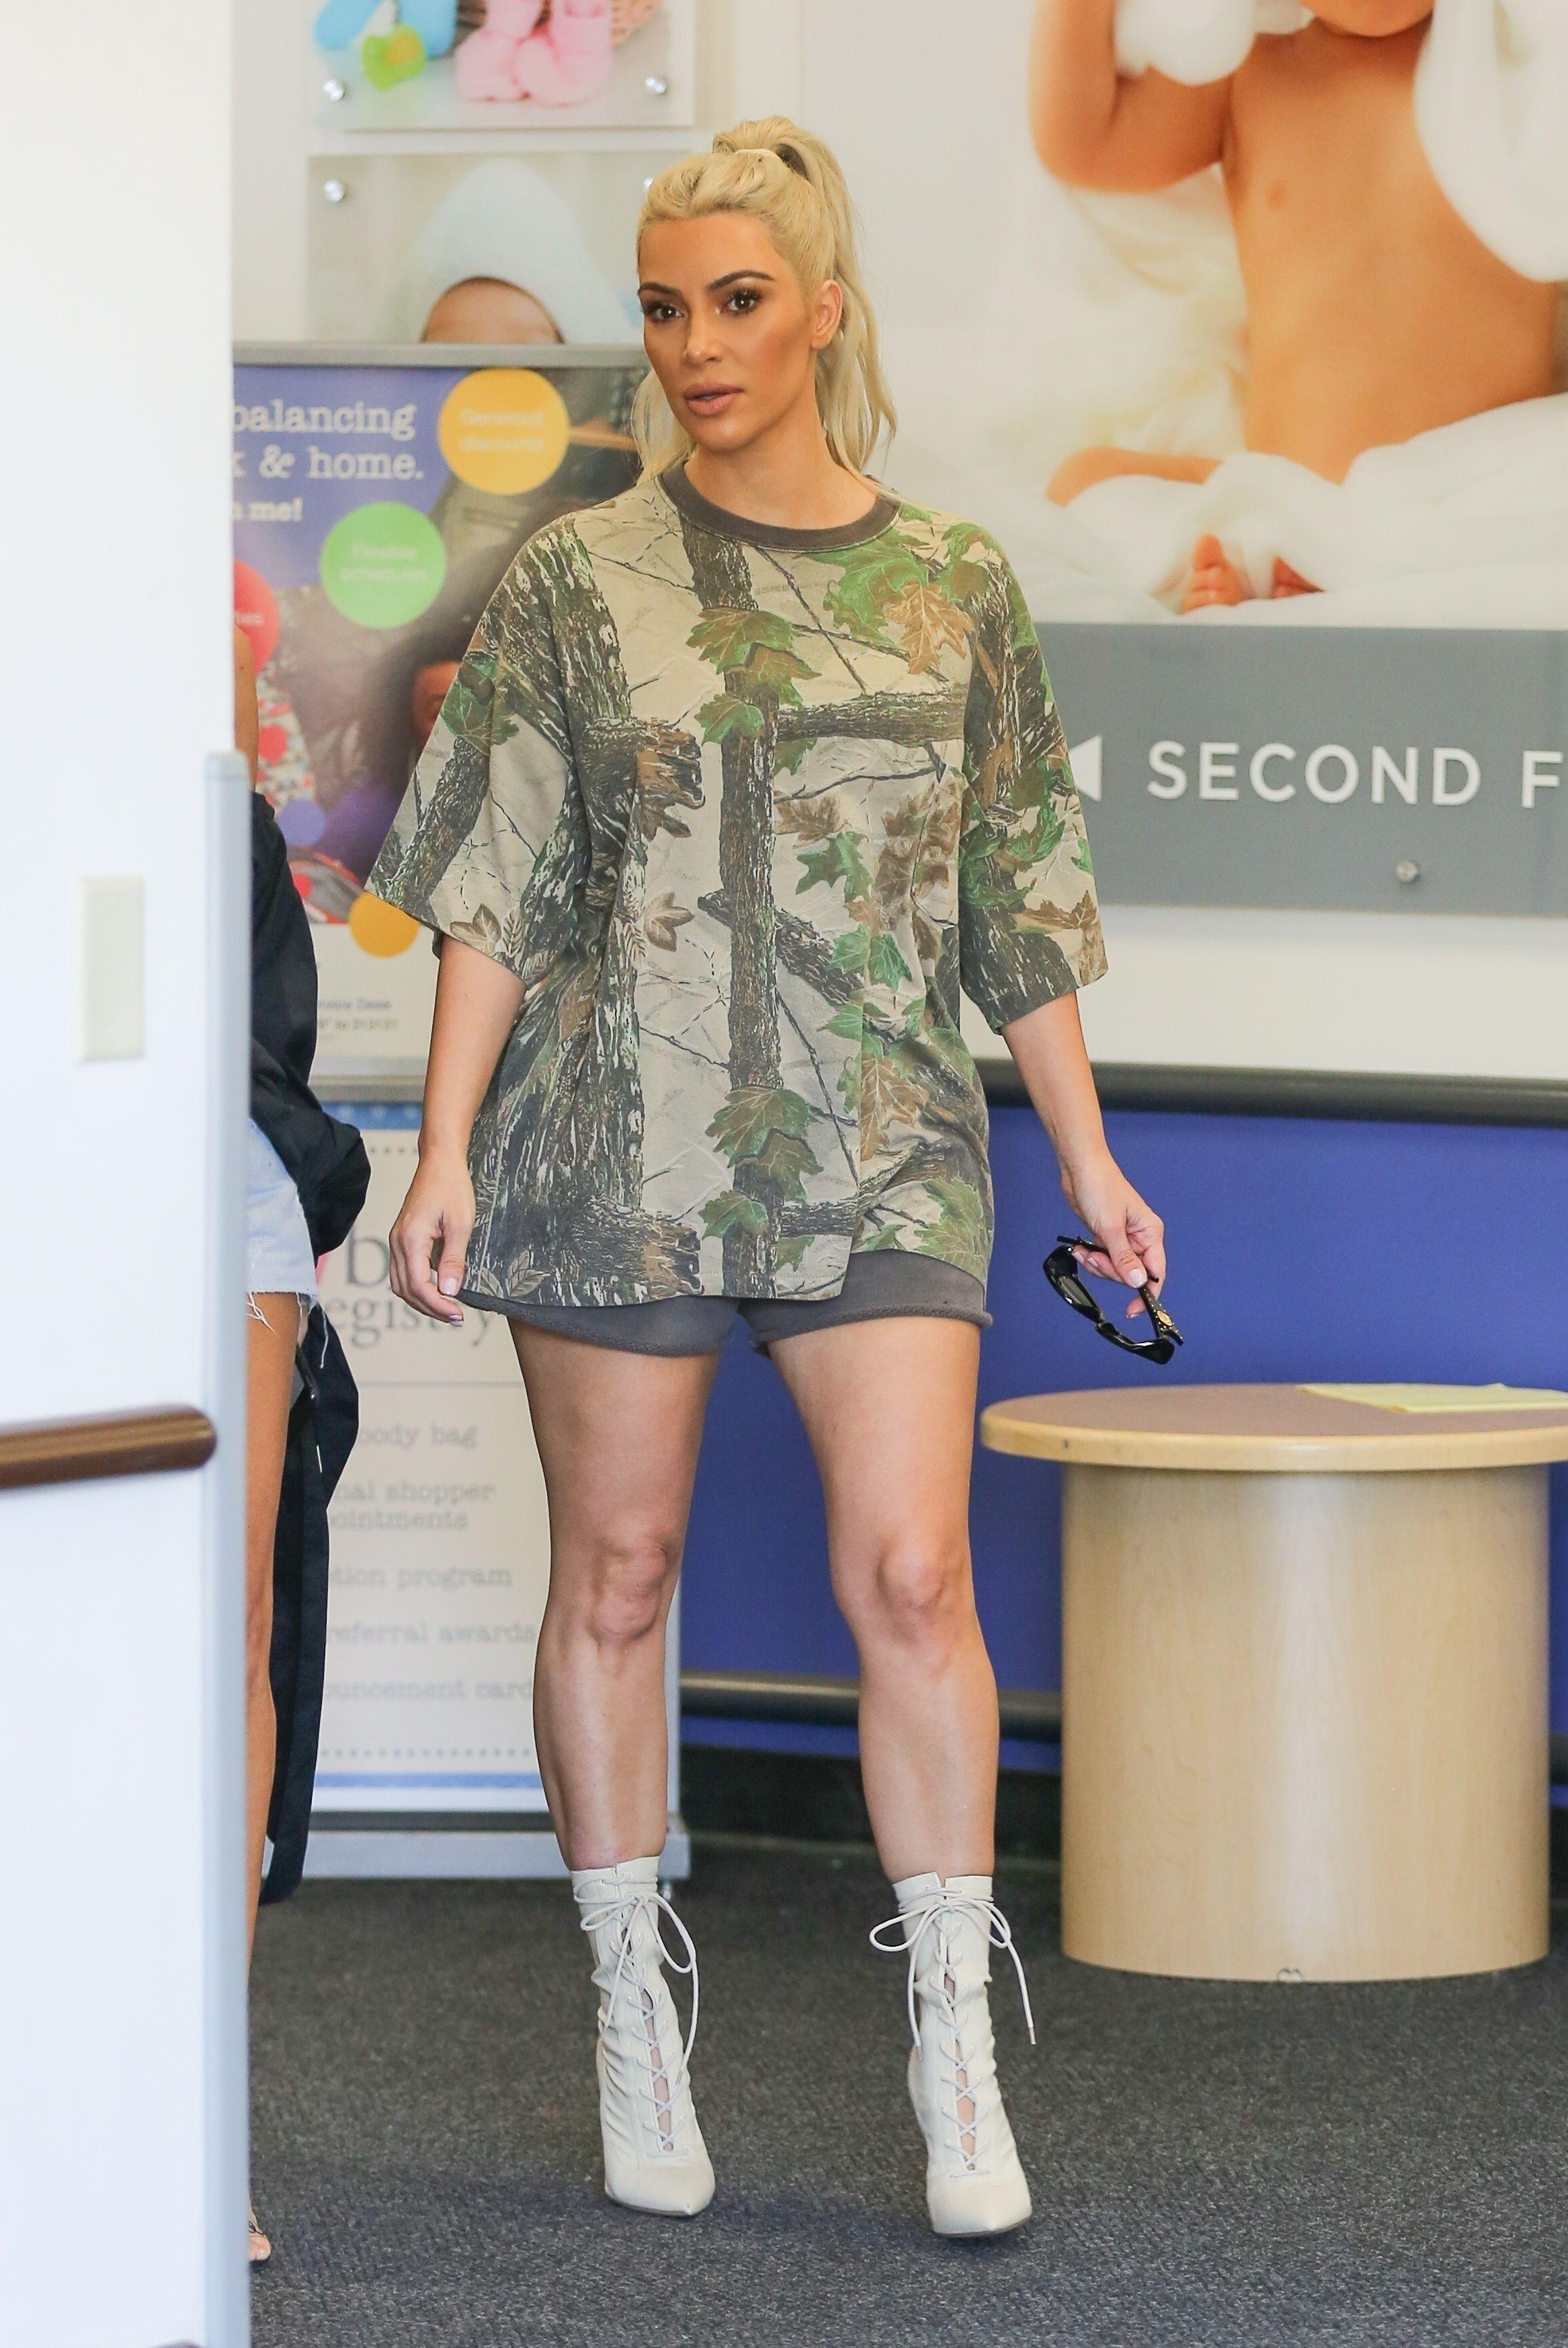 Kim And Kourtney Kardashian Do Their Baby Shopping In Short Shorts